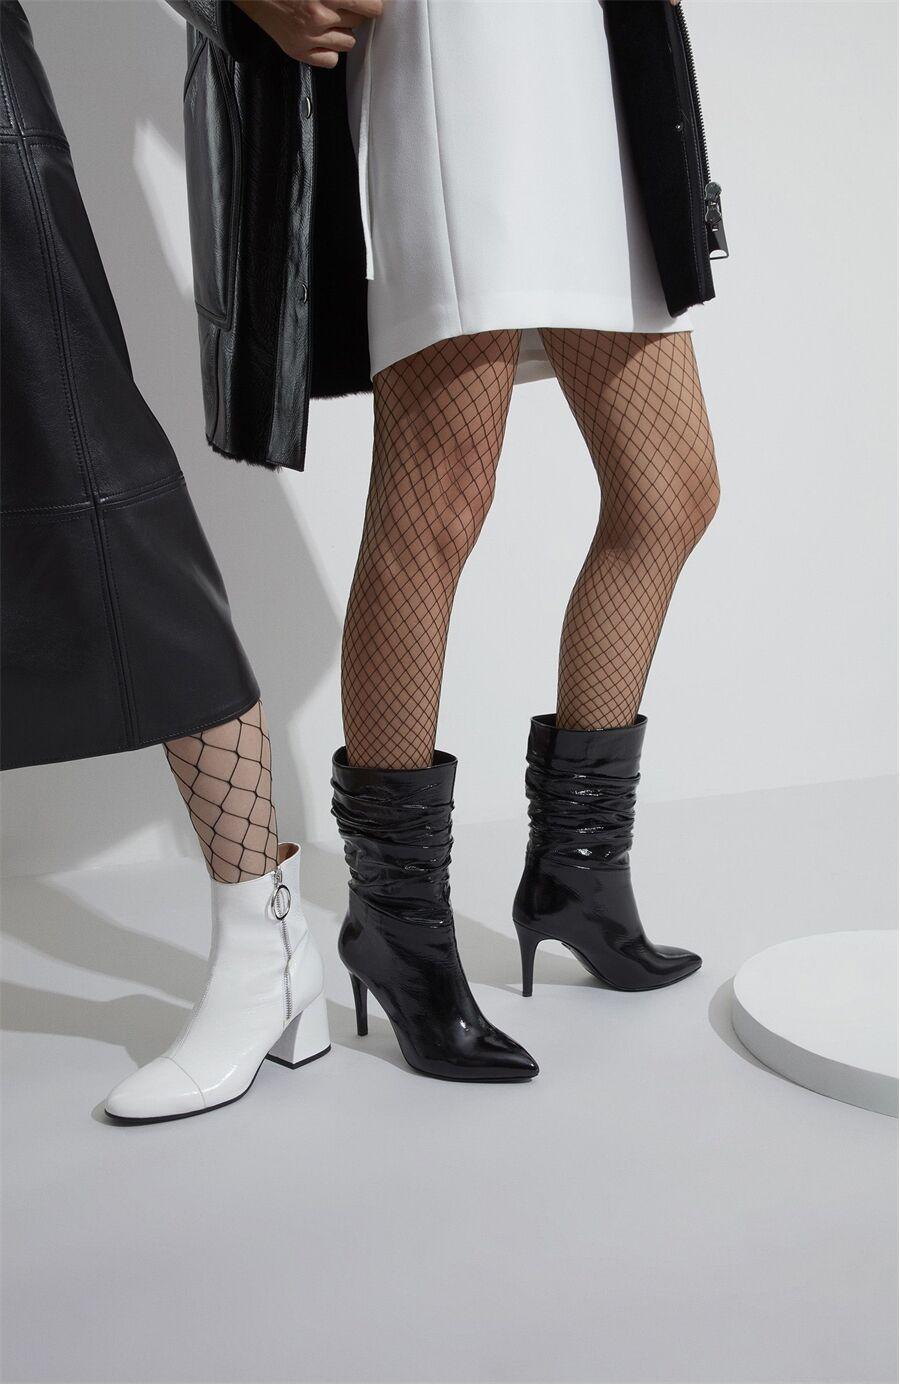 Dıvarese Siyah Çizme – 448.5 TL